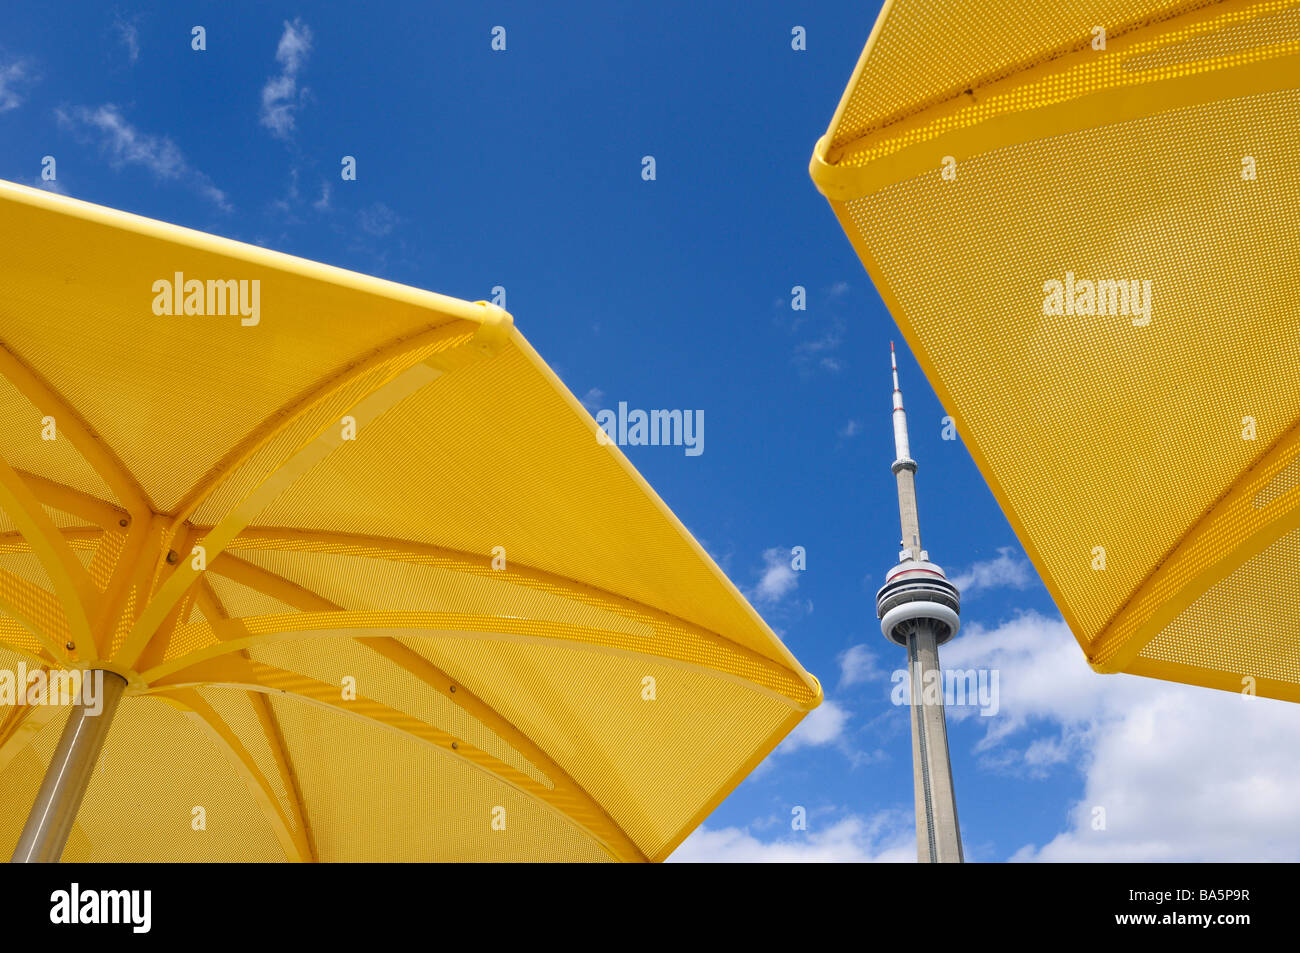 Toronto CN tower between two yellow metal beach umbrellas at urban beach of HTO Park - Stock Image